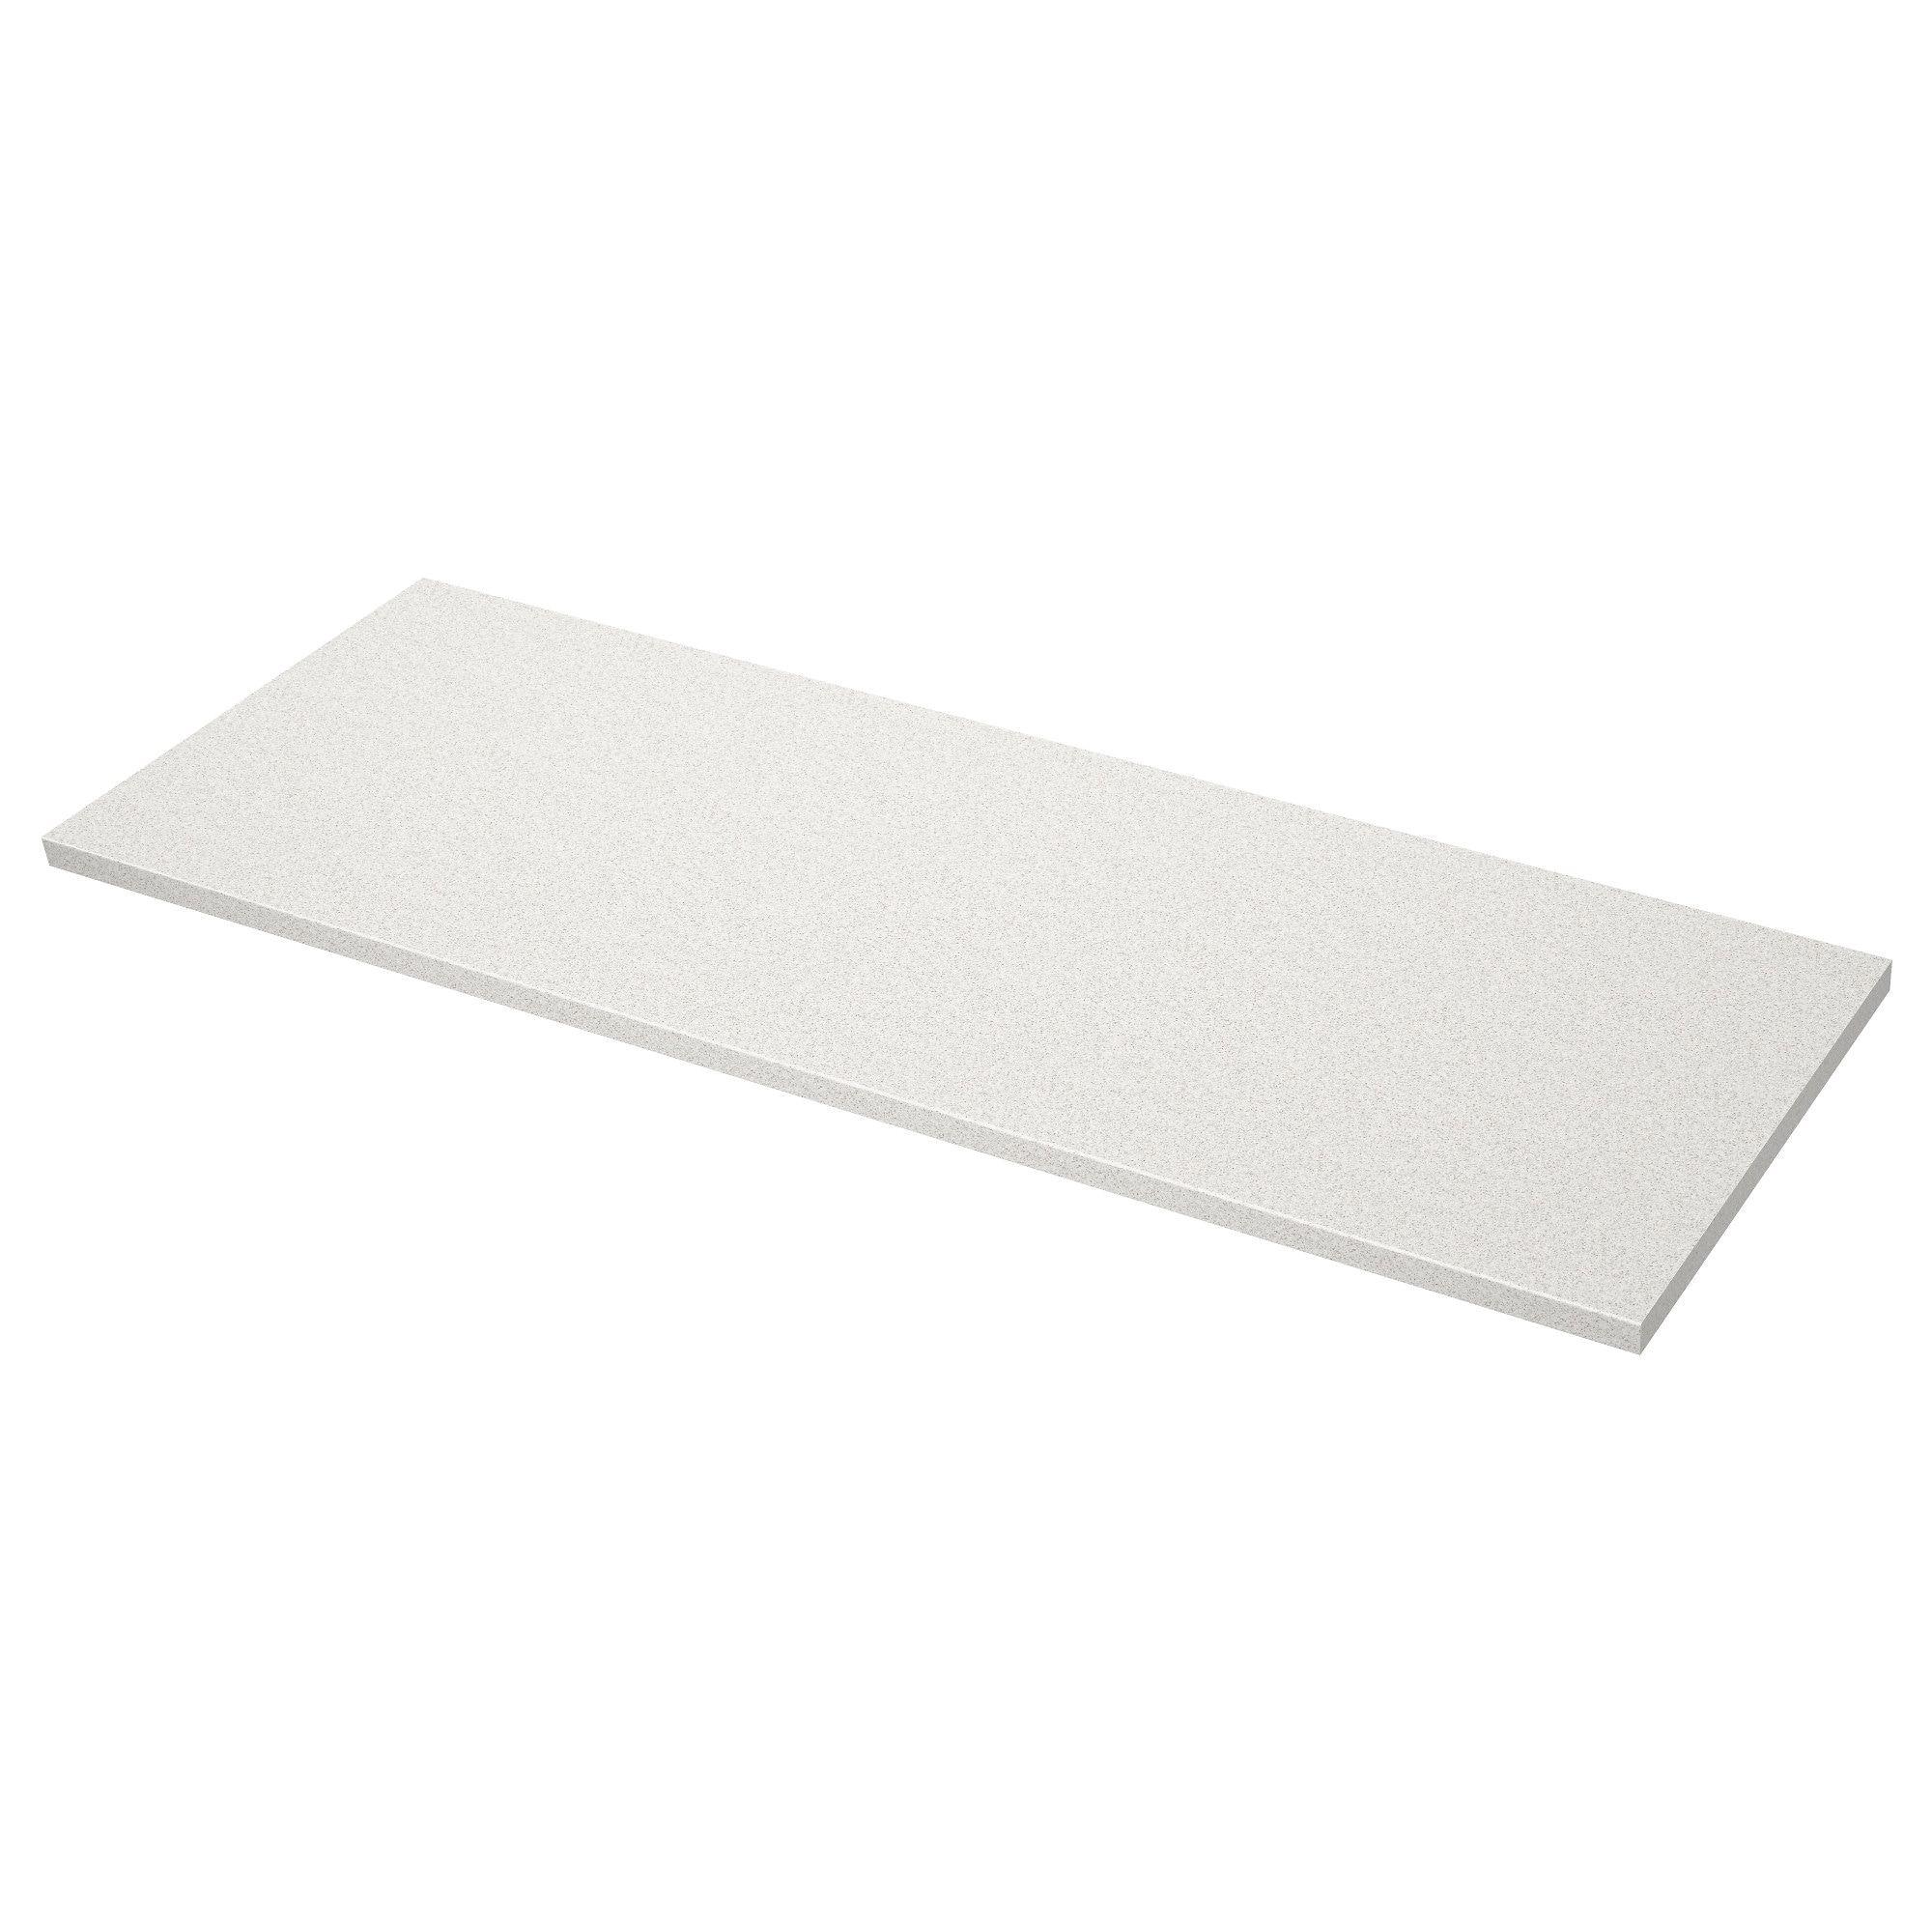 Saljan Countertop White Stone Effect Laminate 74x1 1 2 Countertops Laminate Countertops Kitchen Countertops